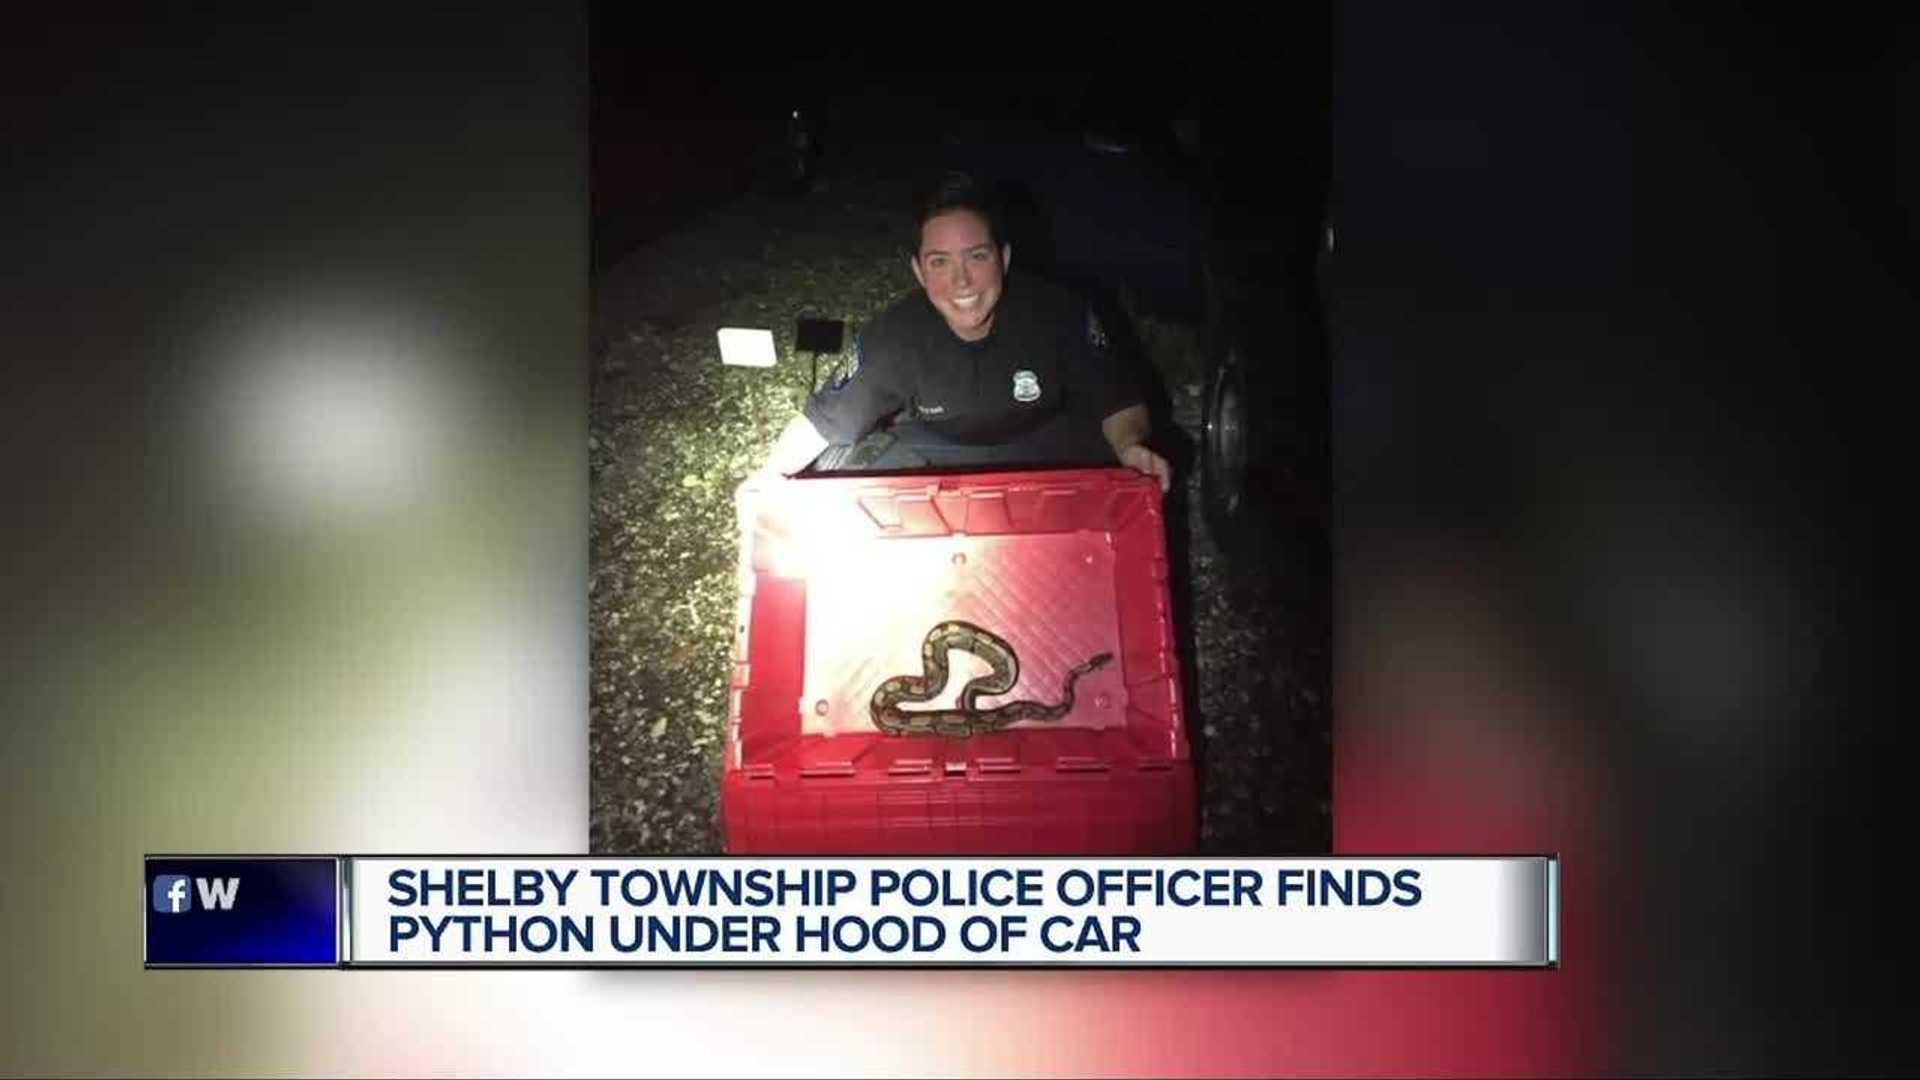 Michigan Police Find Python Hiding Under Hood Of Corvette